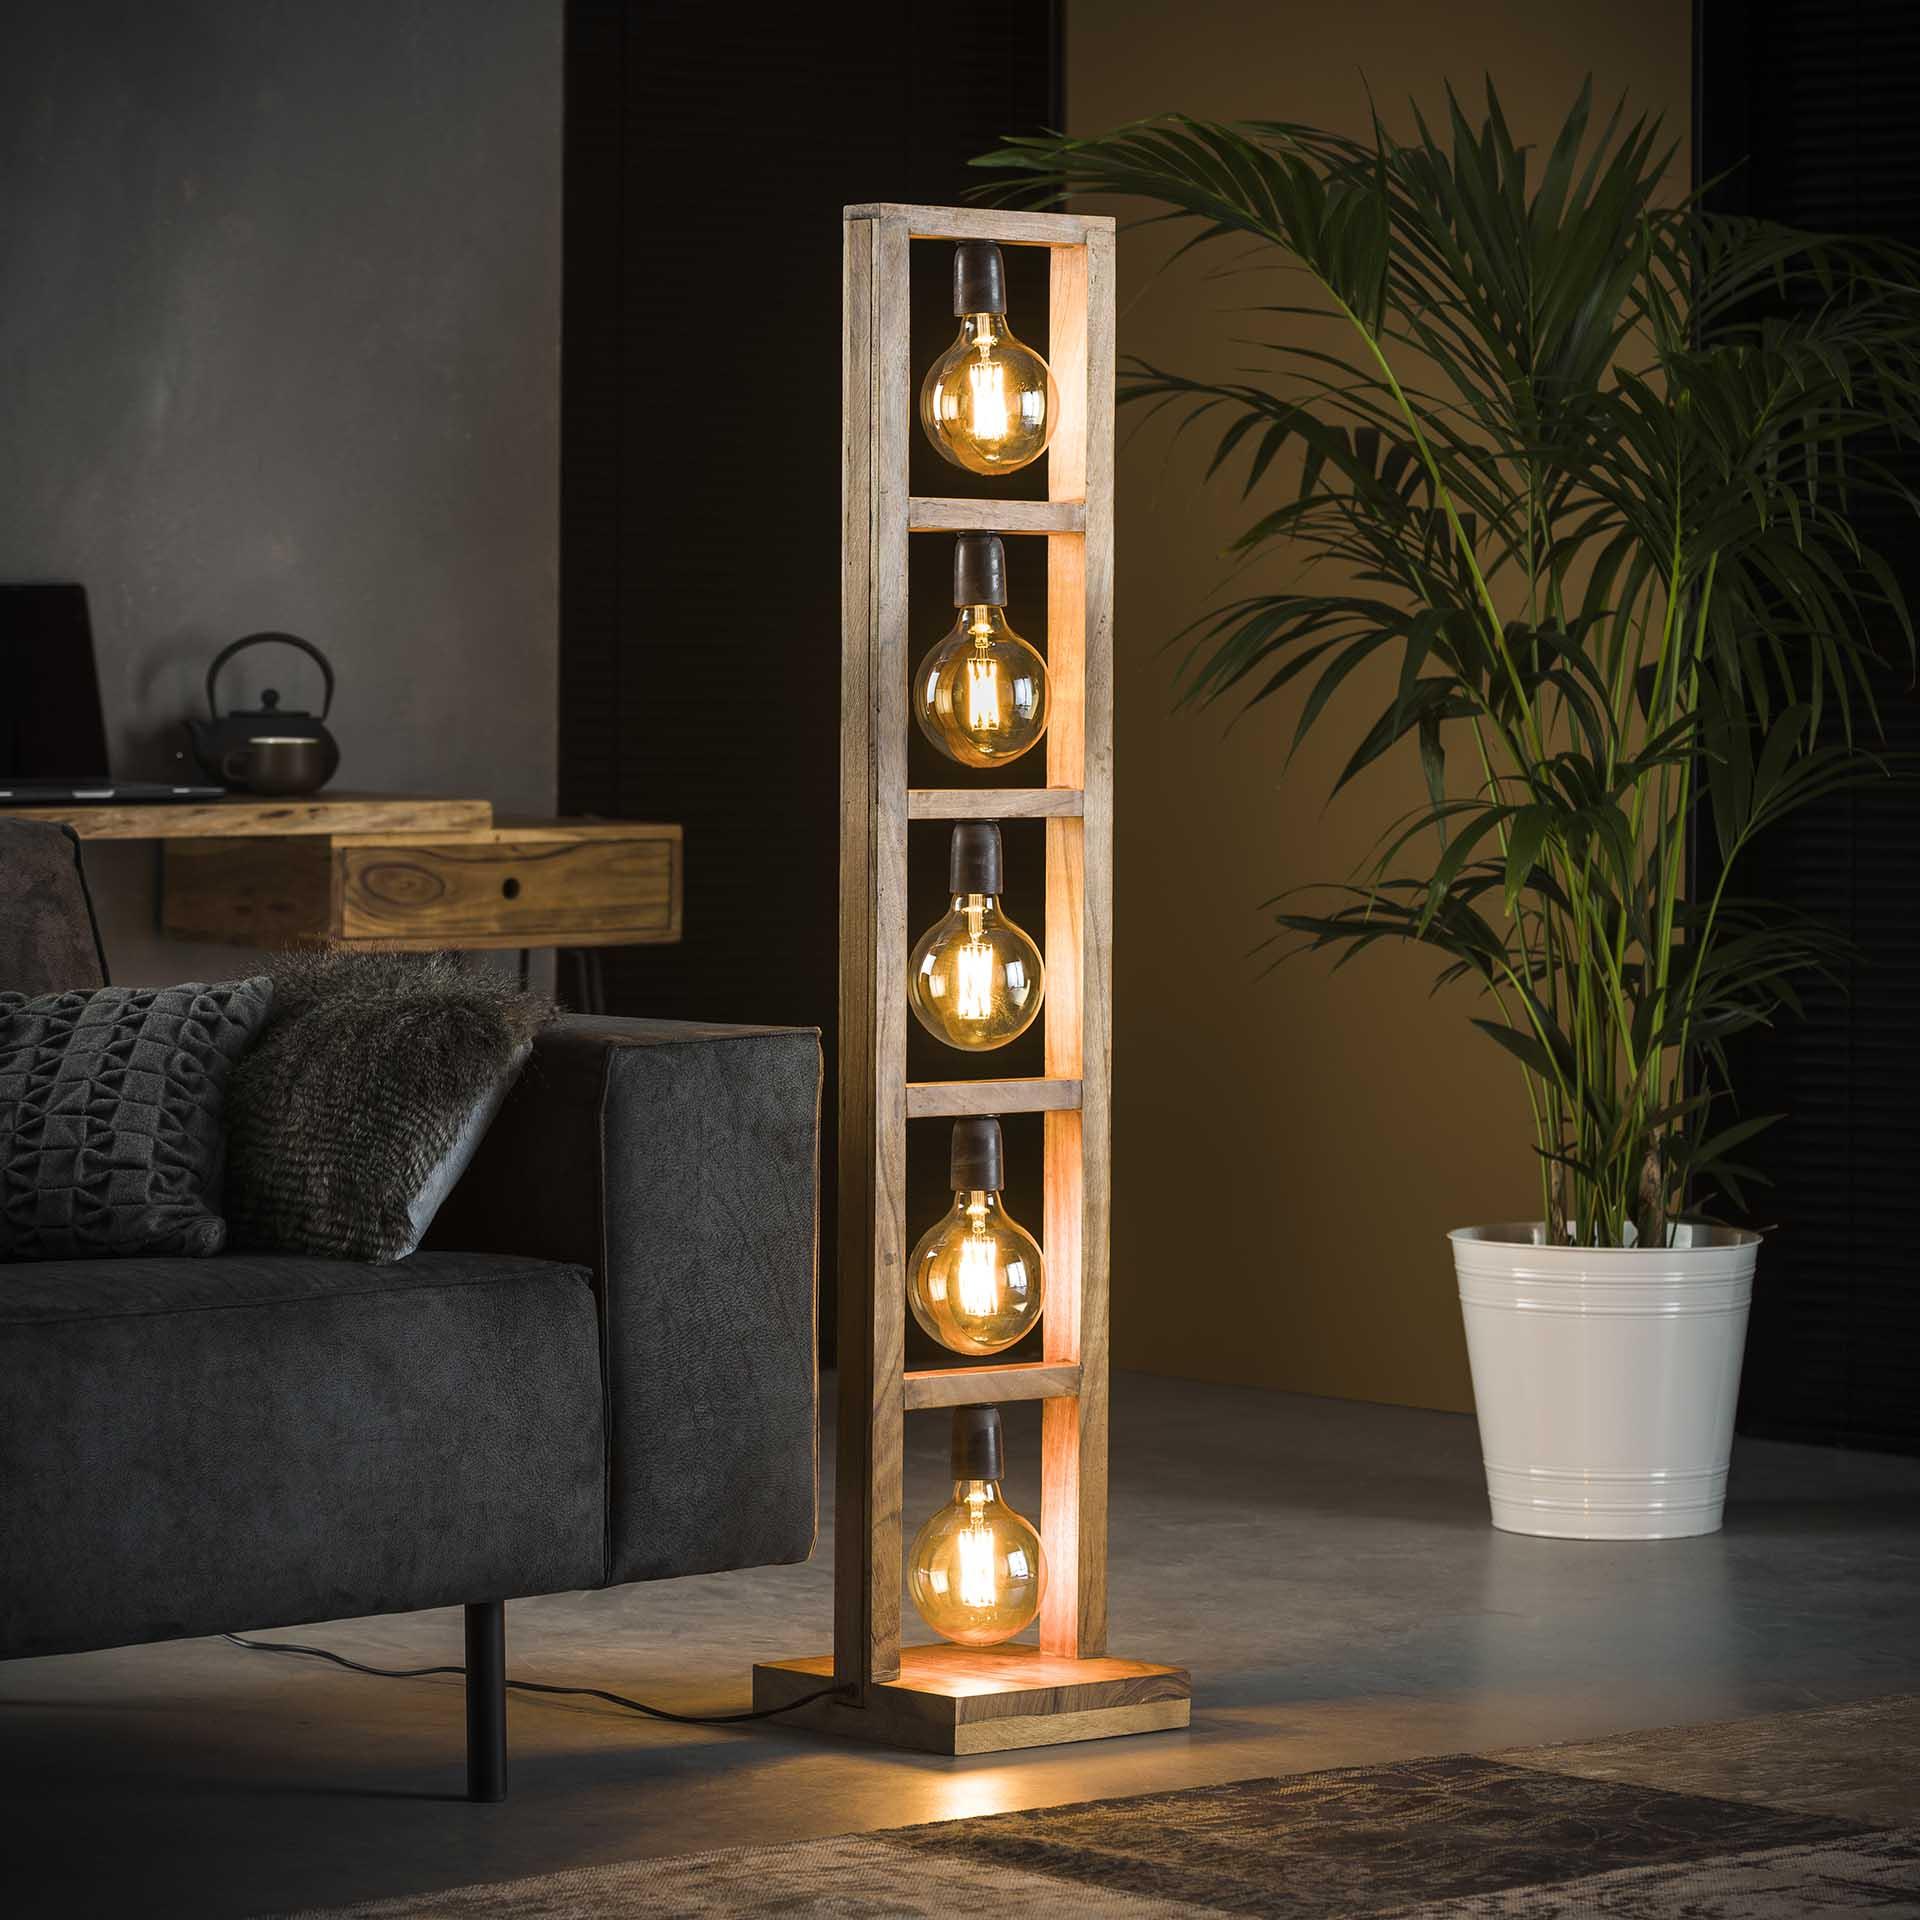 Vloerlamp 5L modulo houten frame - Massief acacia naturel